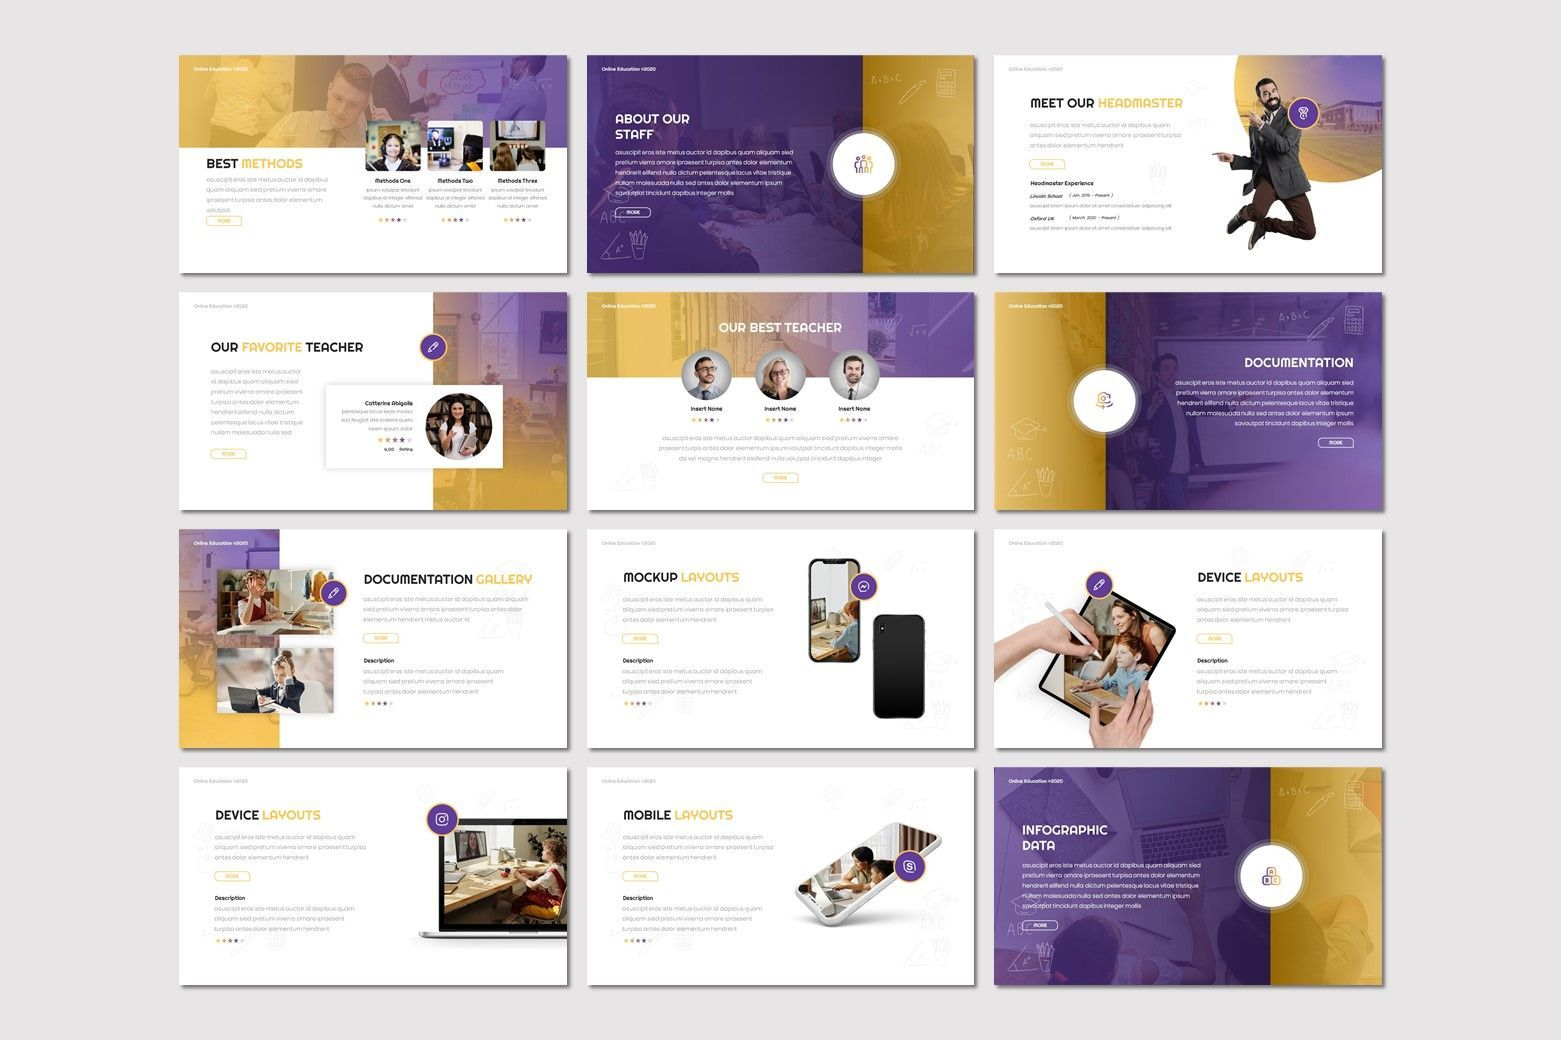 Online Education - Powerpoint Template, Slide 3, 08034, Presentation Templates — PoweredTemplate.com